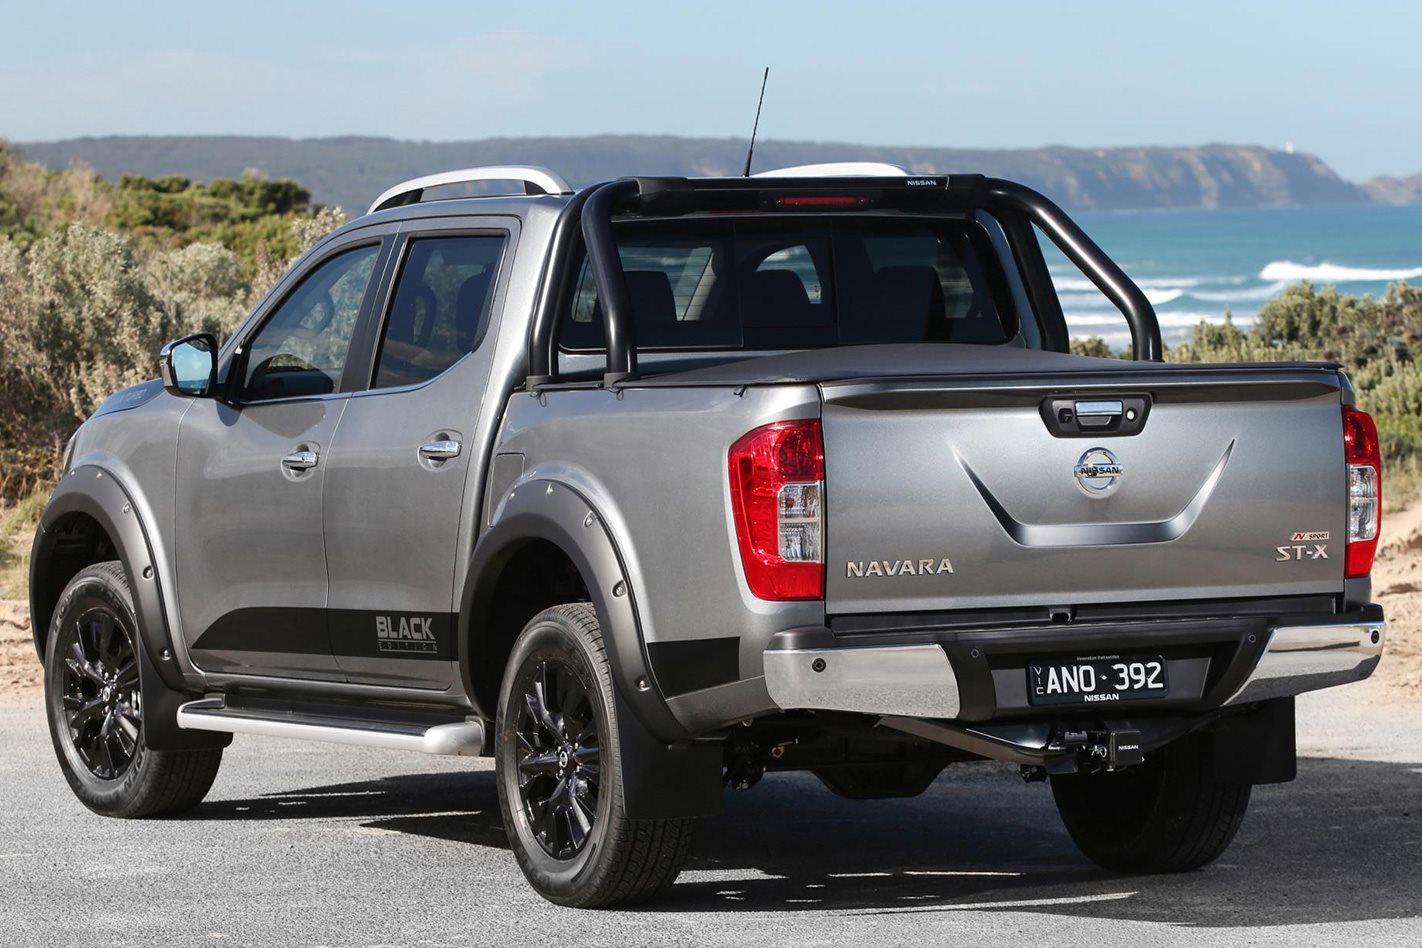 Nissan Navara N SPORT Black Edition ute